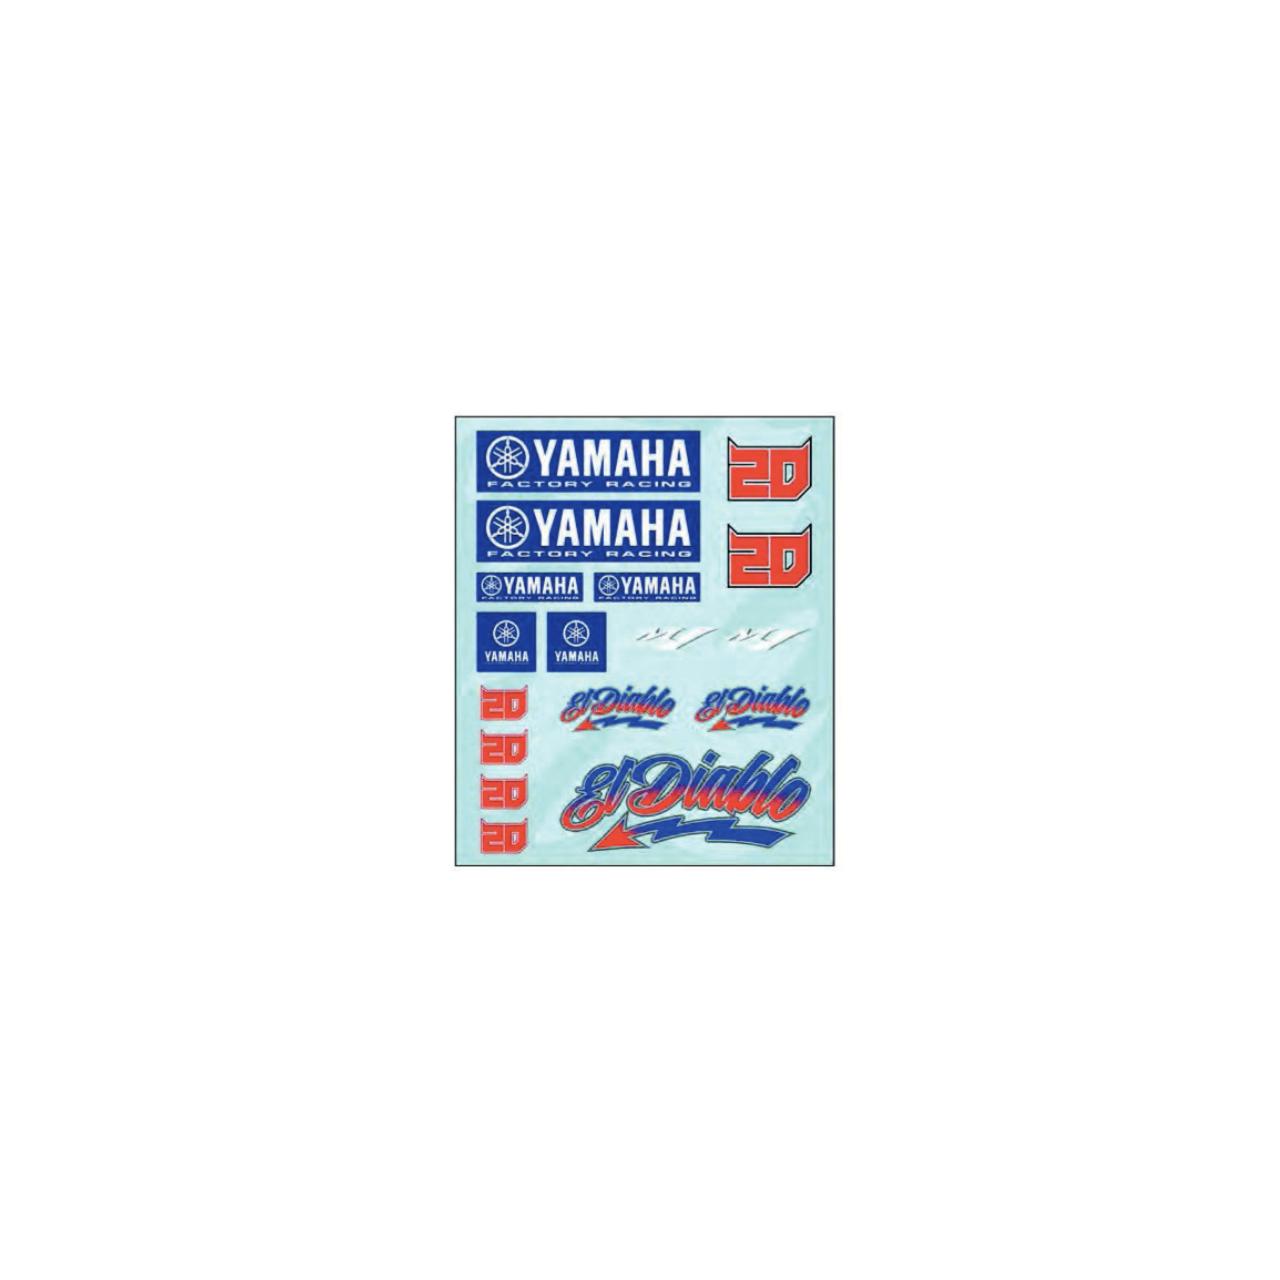 YAMAHA Autocollant sticker Quartararo El Diablo